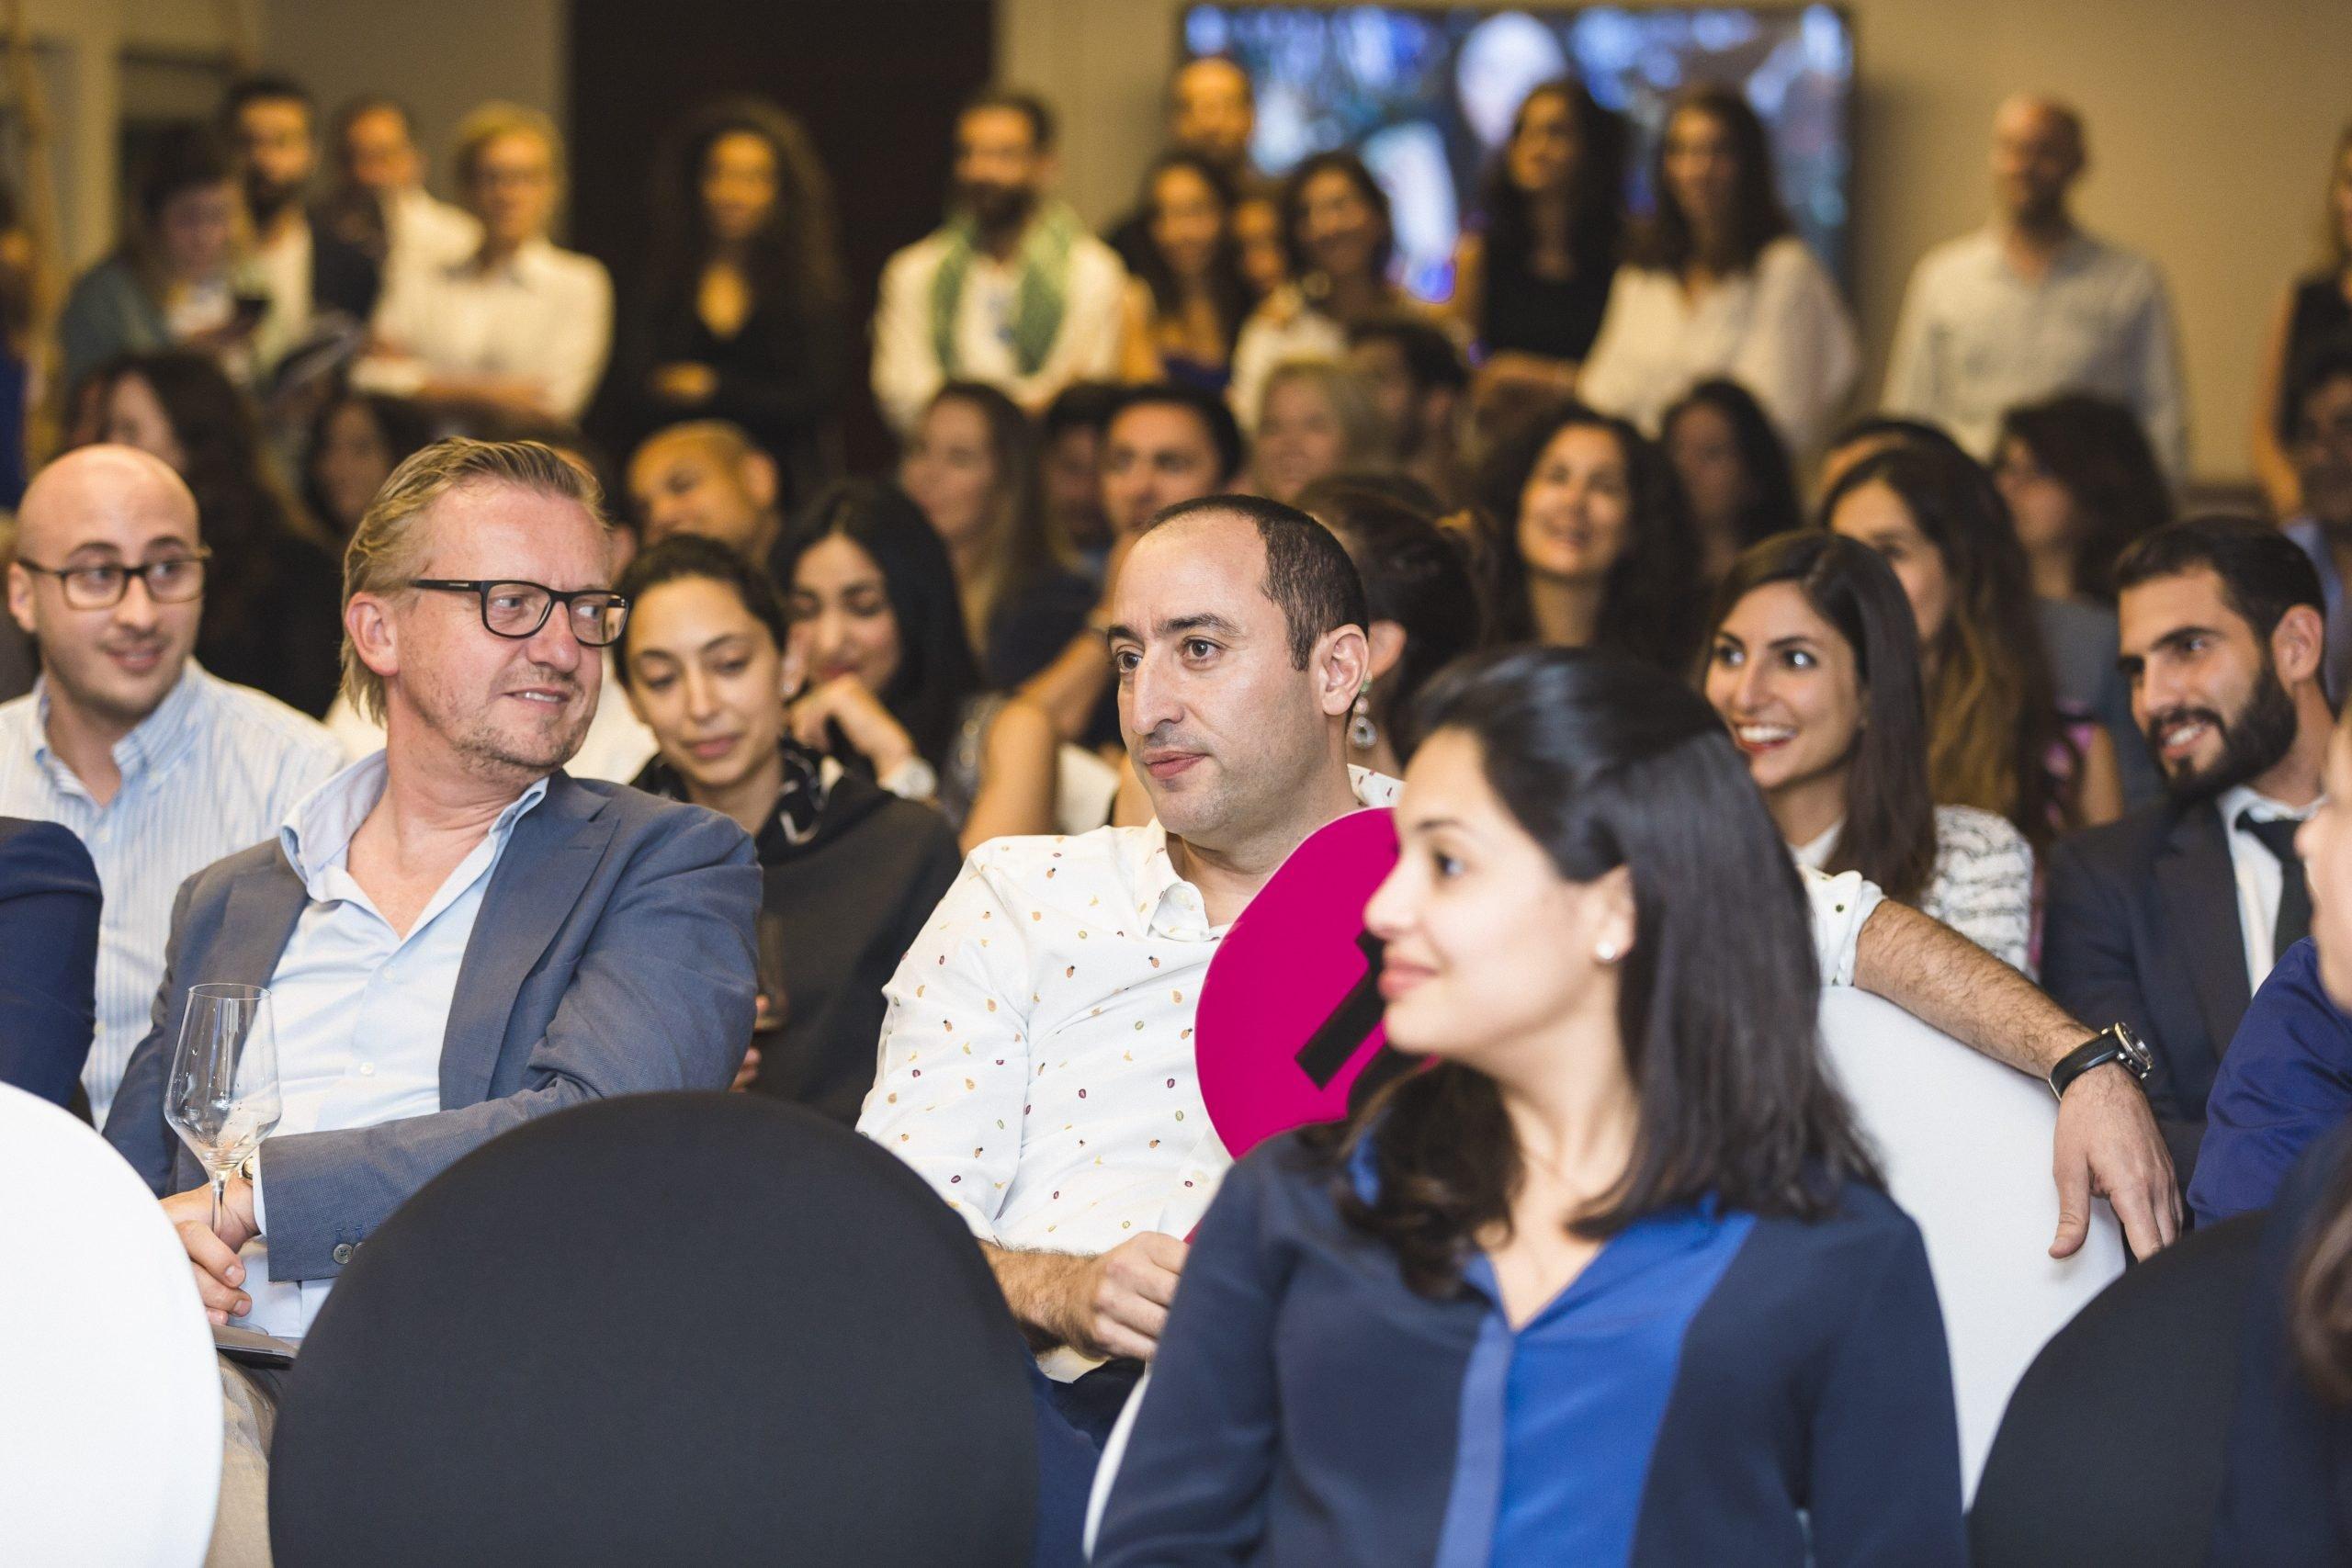 Emergeast Auction III: Shifting Forward held on April 27th 2016 in Dubai, U.A.E.